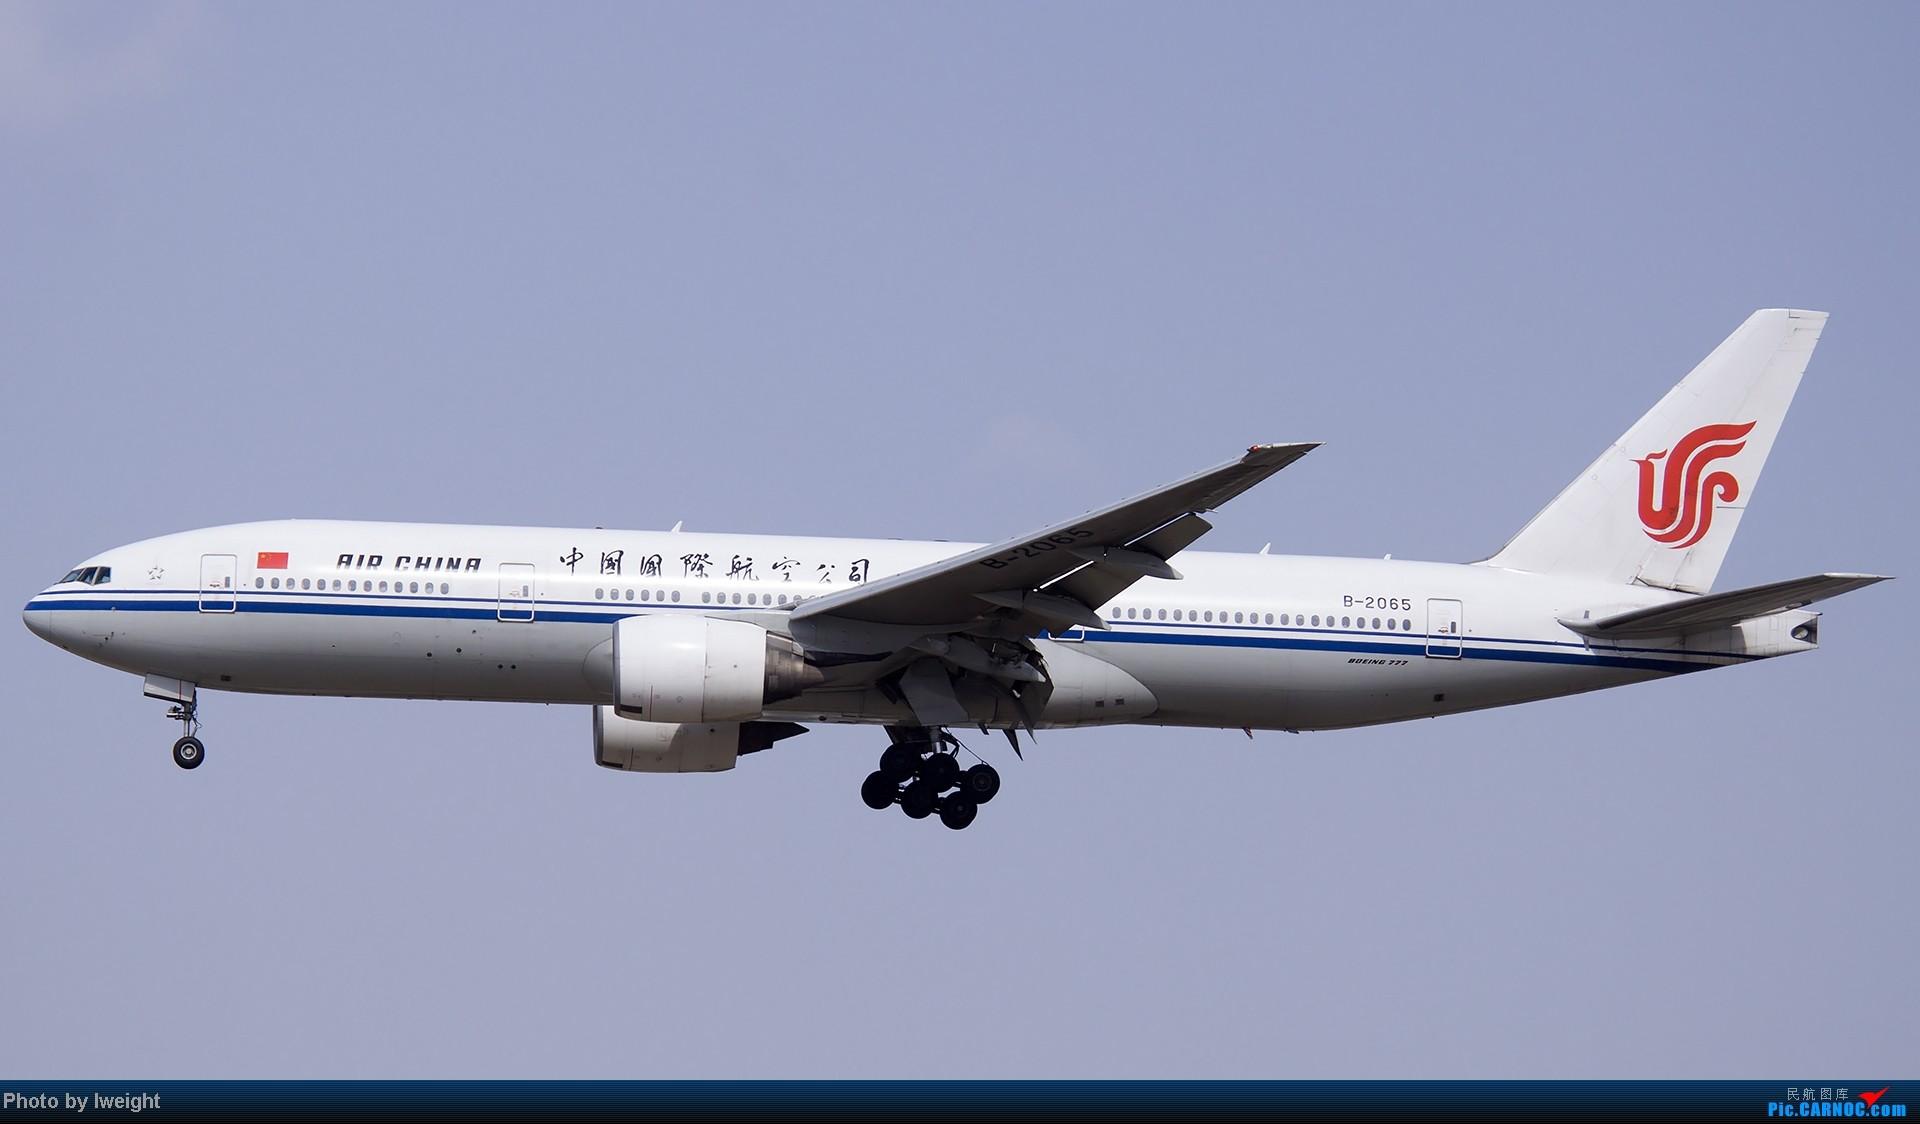 Re:[原创]5月3日首都机场风云变幻的下午 BOEING 777-200 B-2065 中国北京首都机场